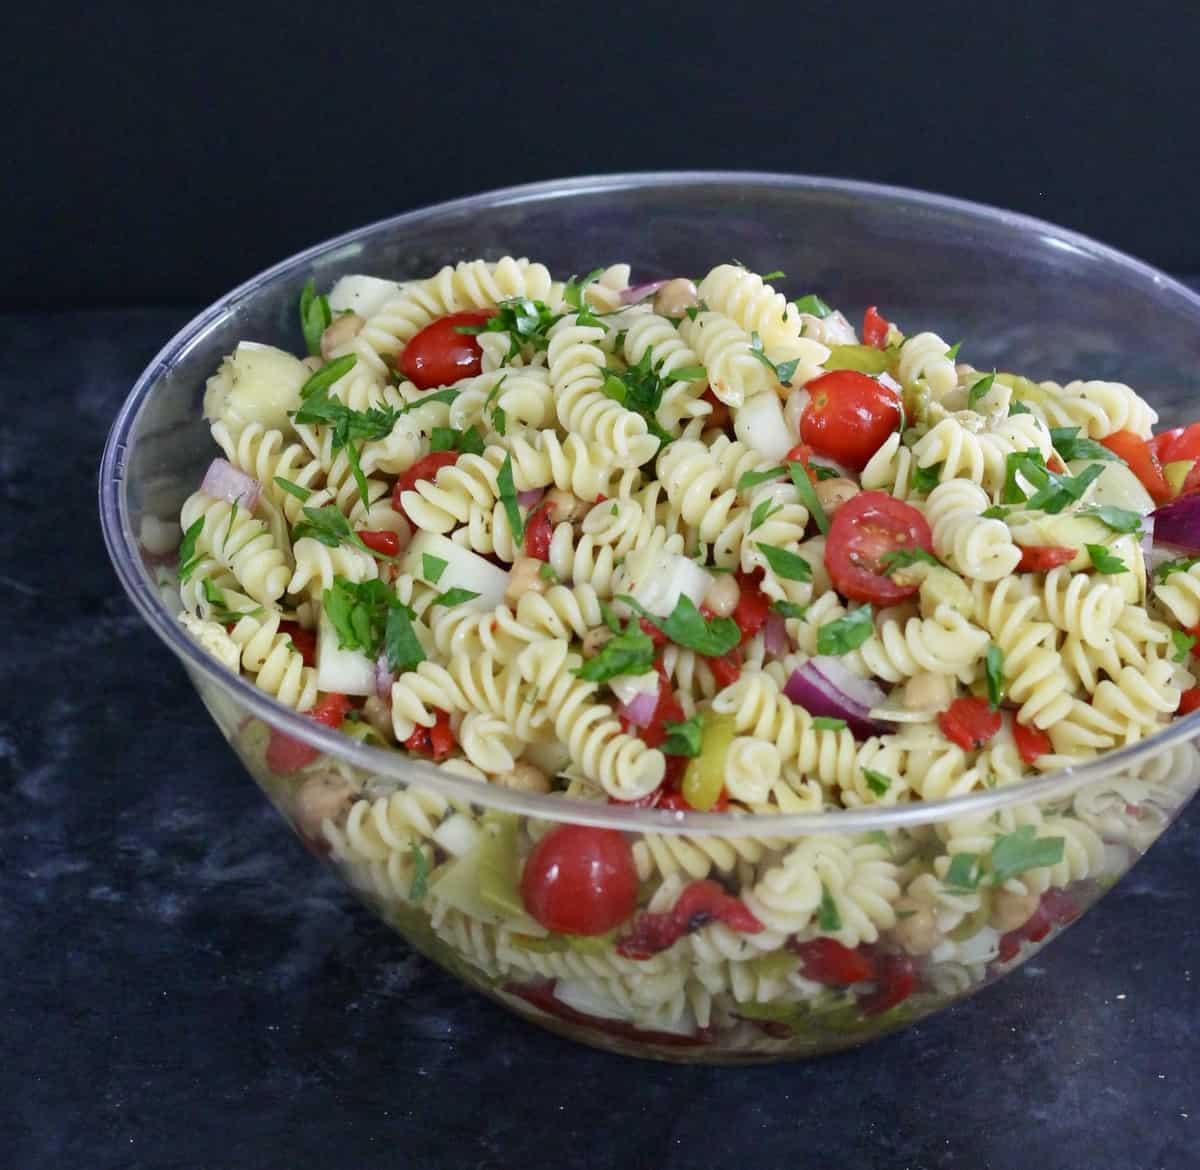 vegan pasta salad in a large bowl